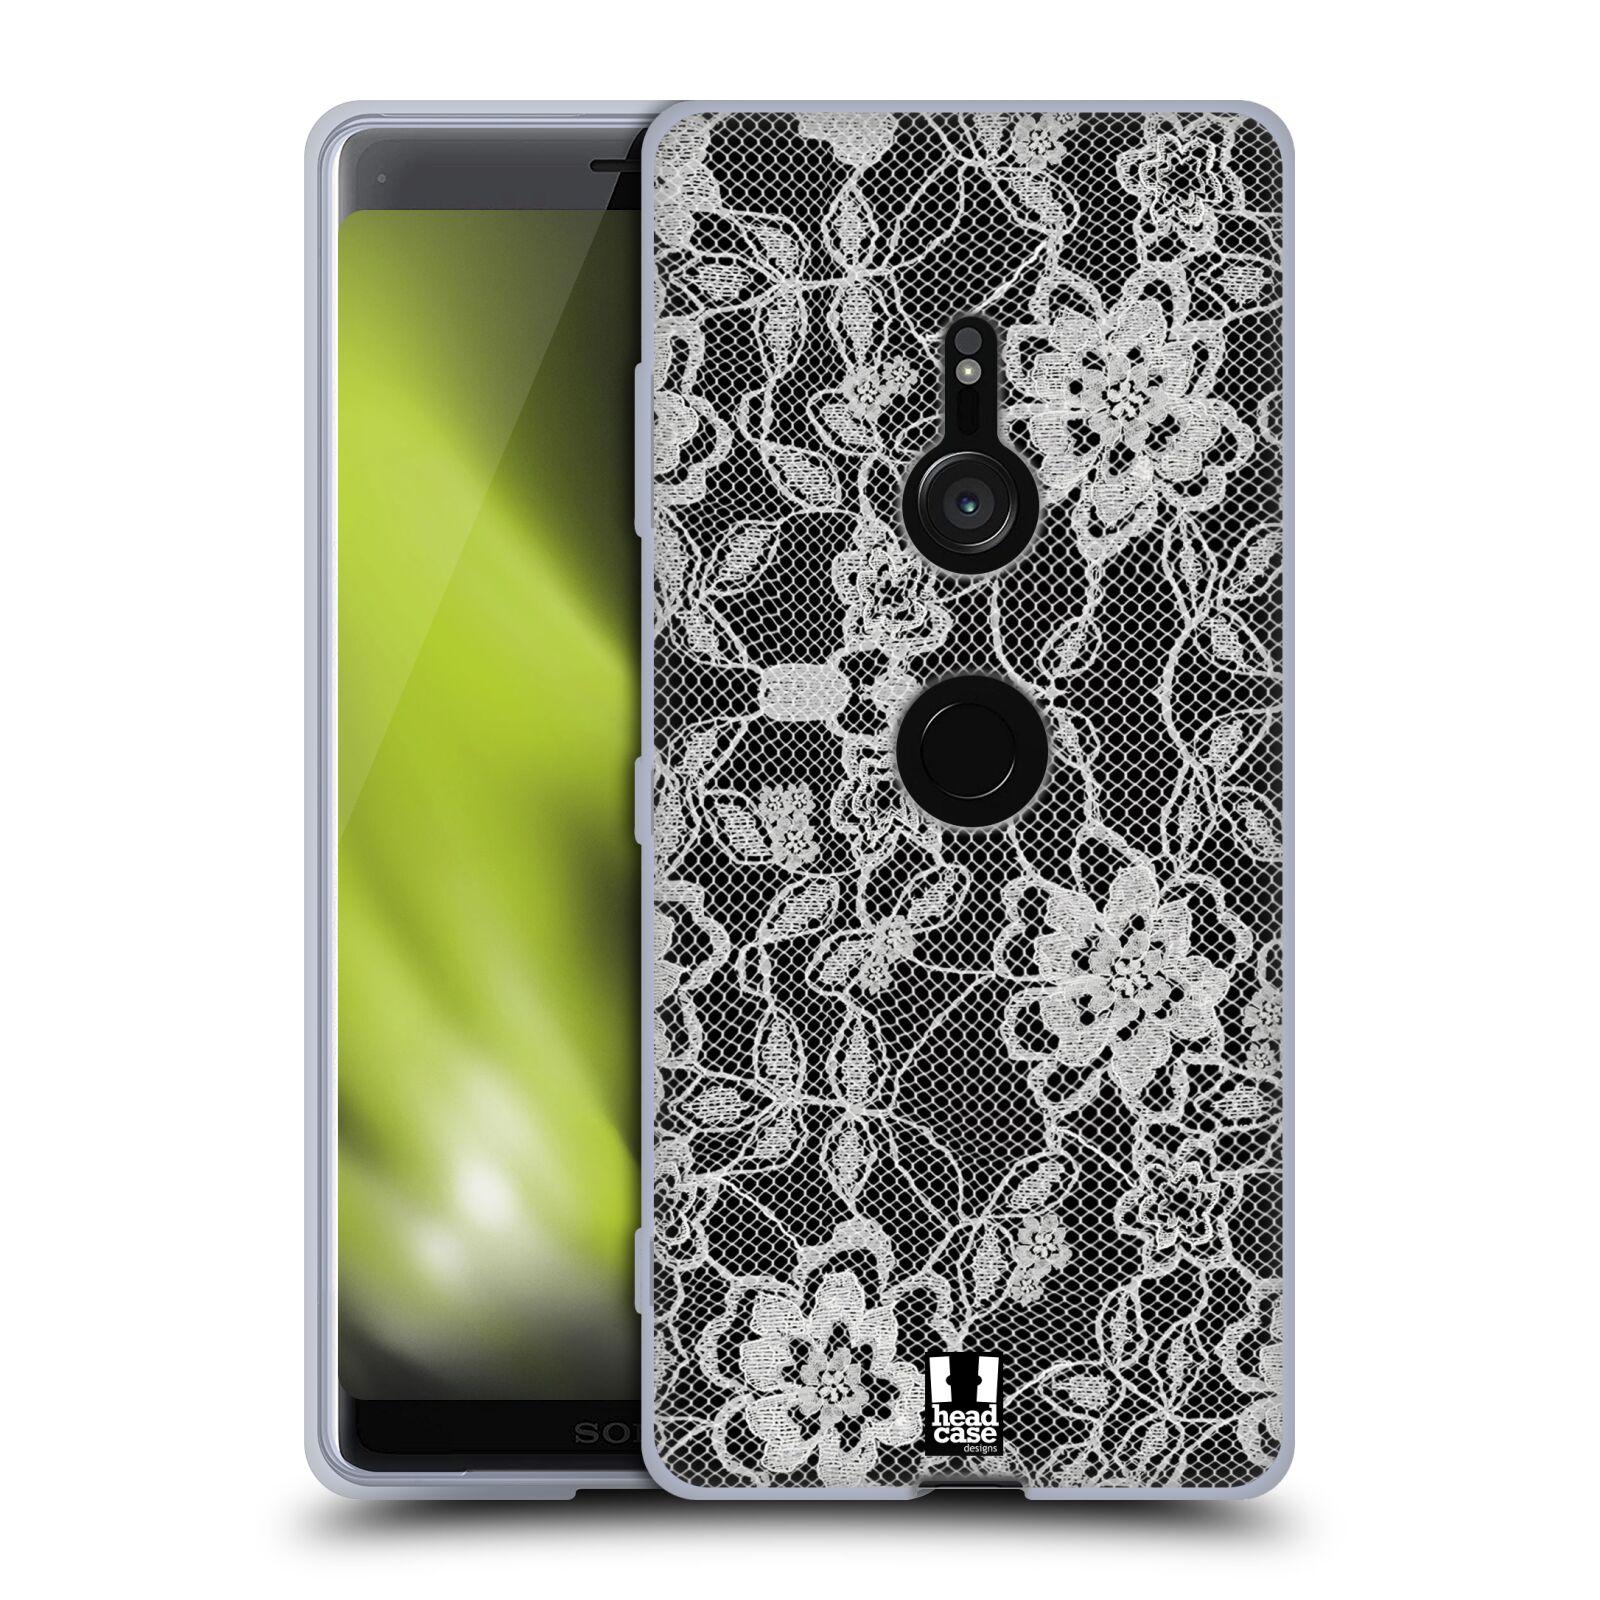 Silikonové pouzdro na mobil Sony Xperia XZ3 - Head Case - FLOWERY KRAJKA